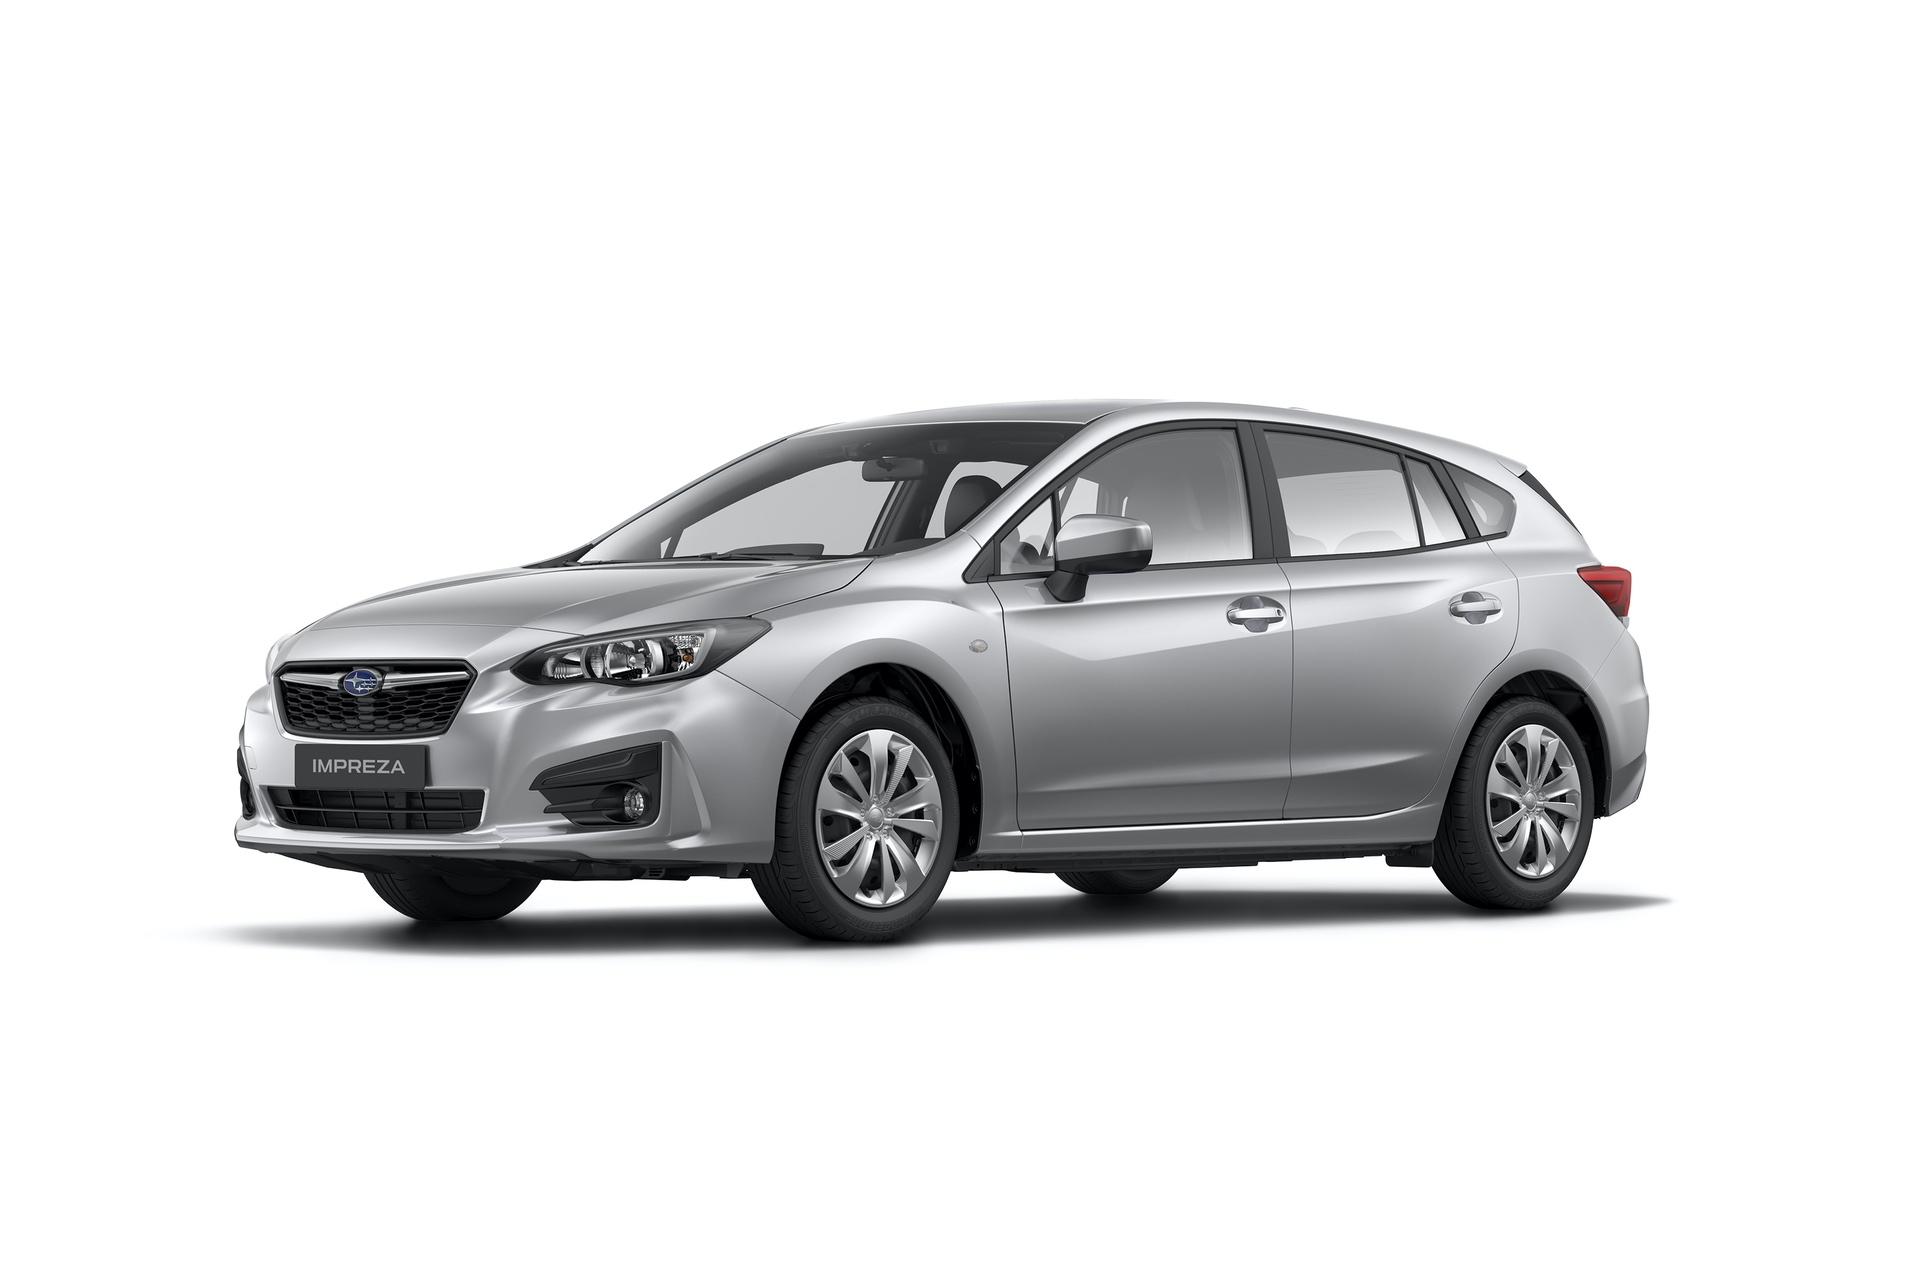 First_Drive_Subaru_Impreza_0009